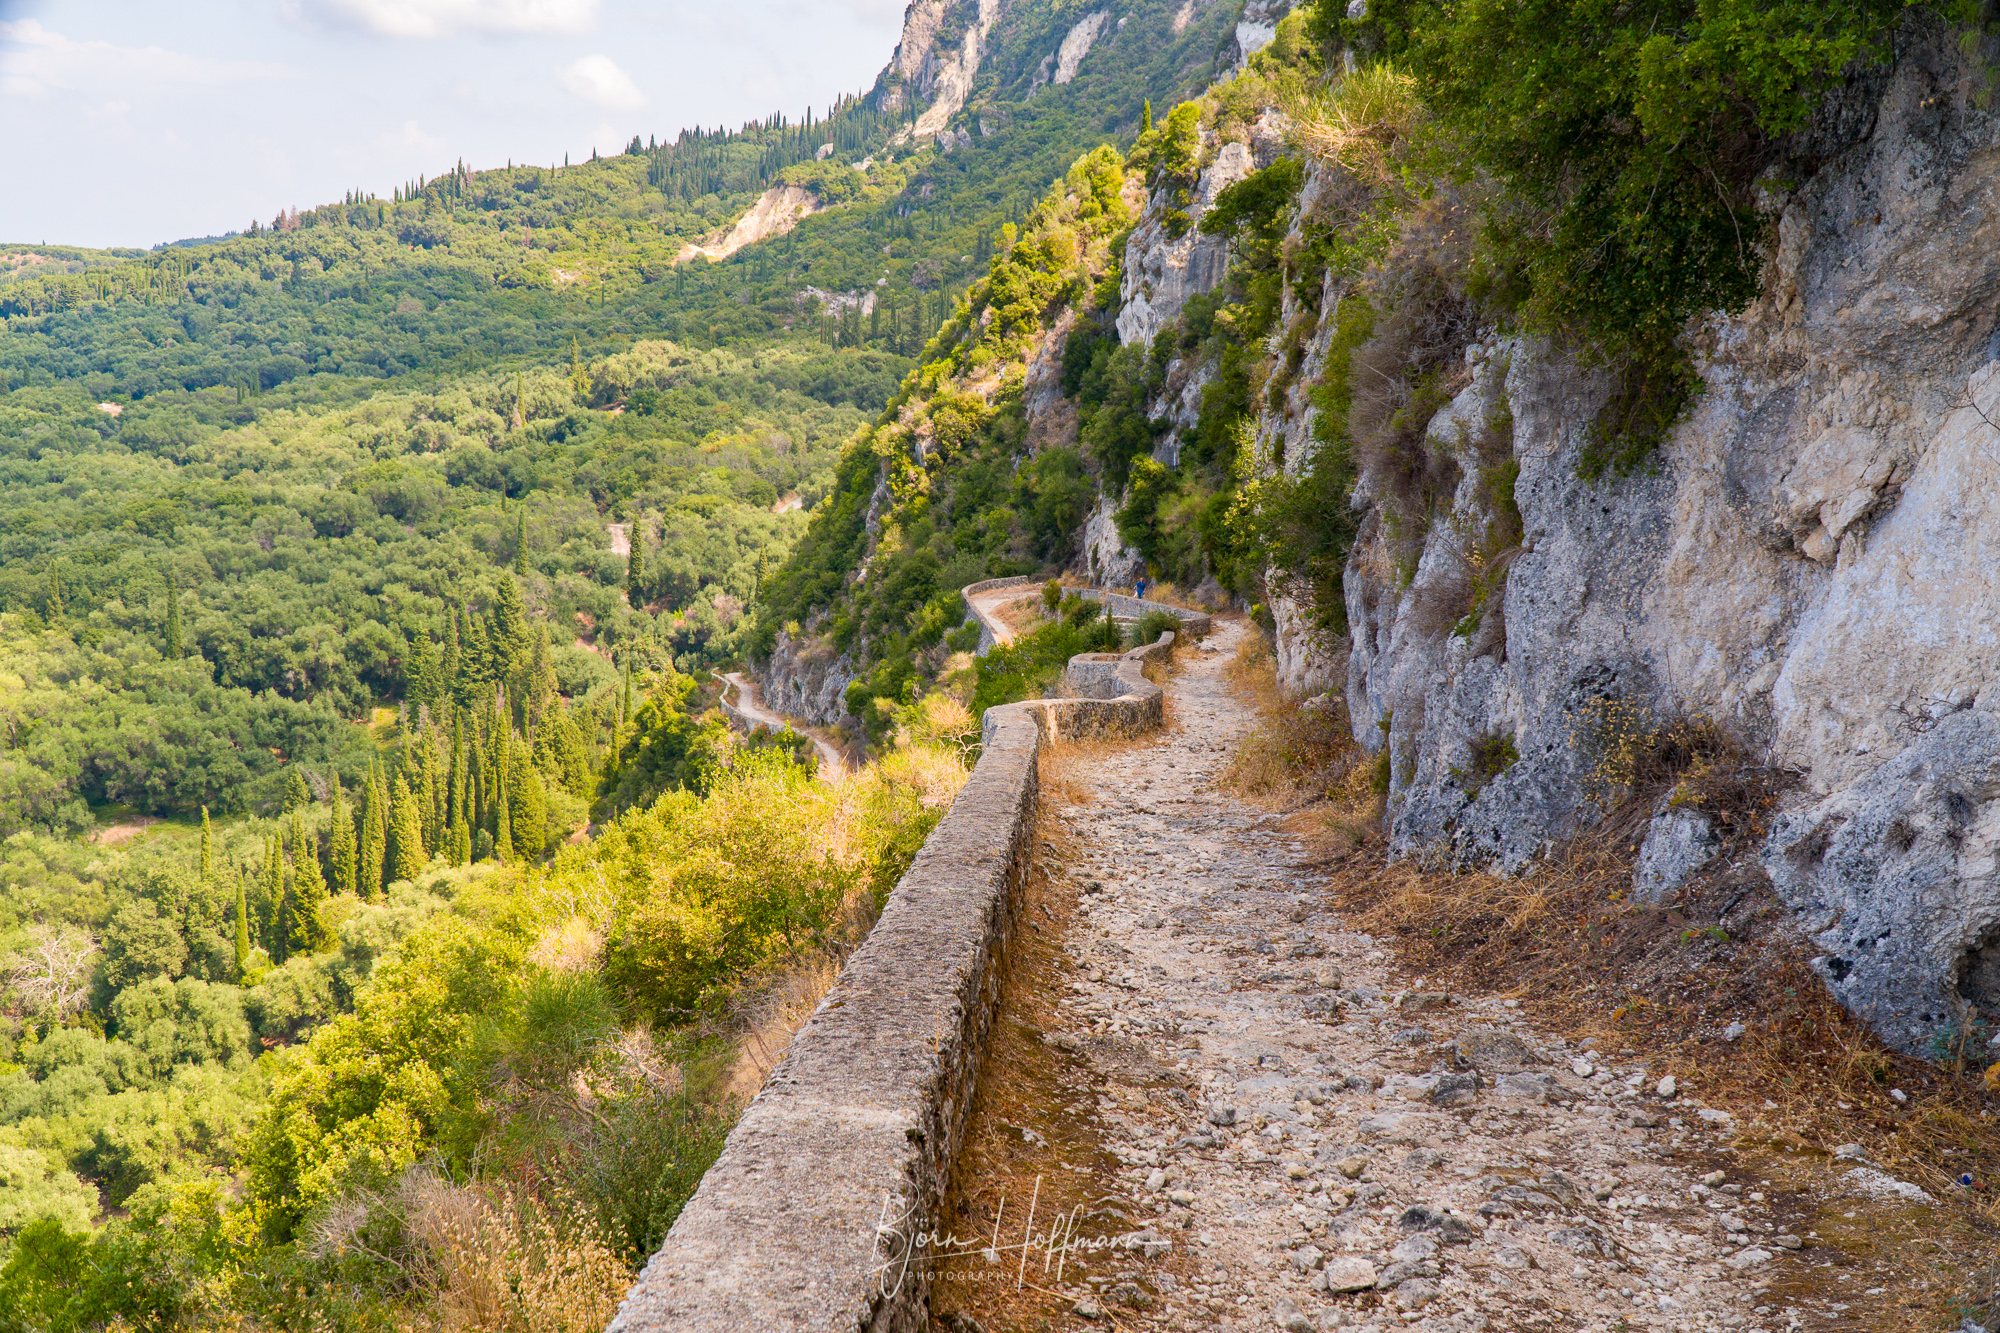 The Donkey Path between Makrades and Agios Georgios, Corfu, Greece